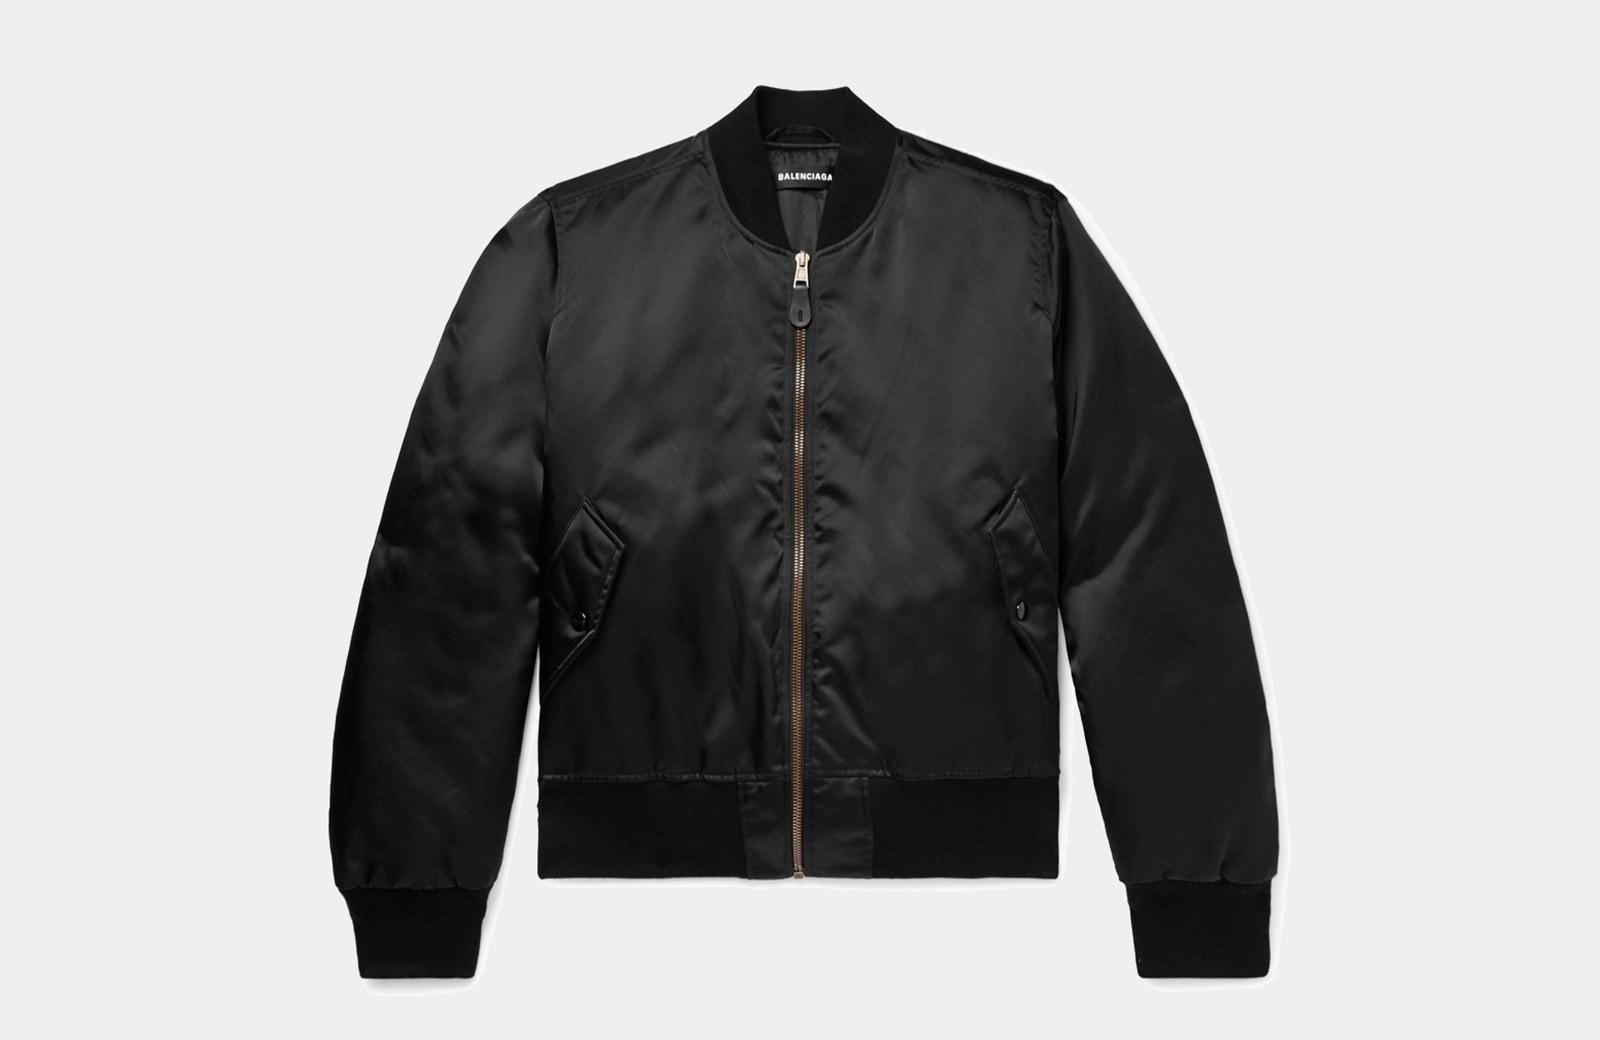 best black bomber jacket men Balenciaga luxury style - Luxe Digital